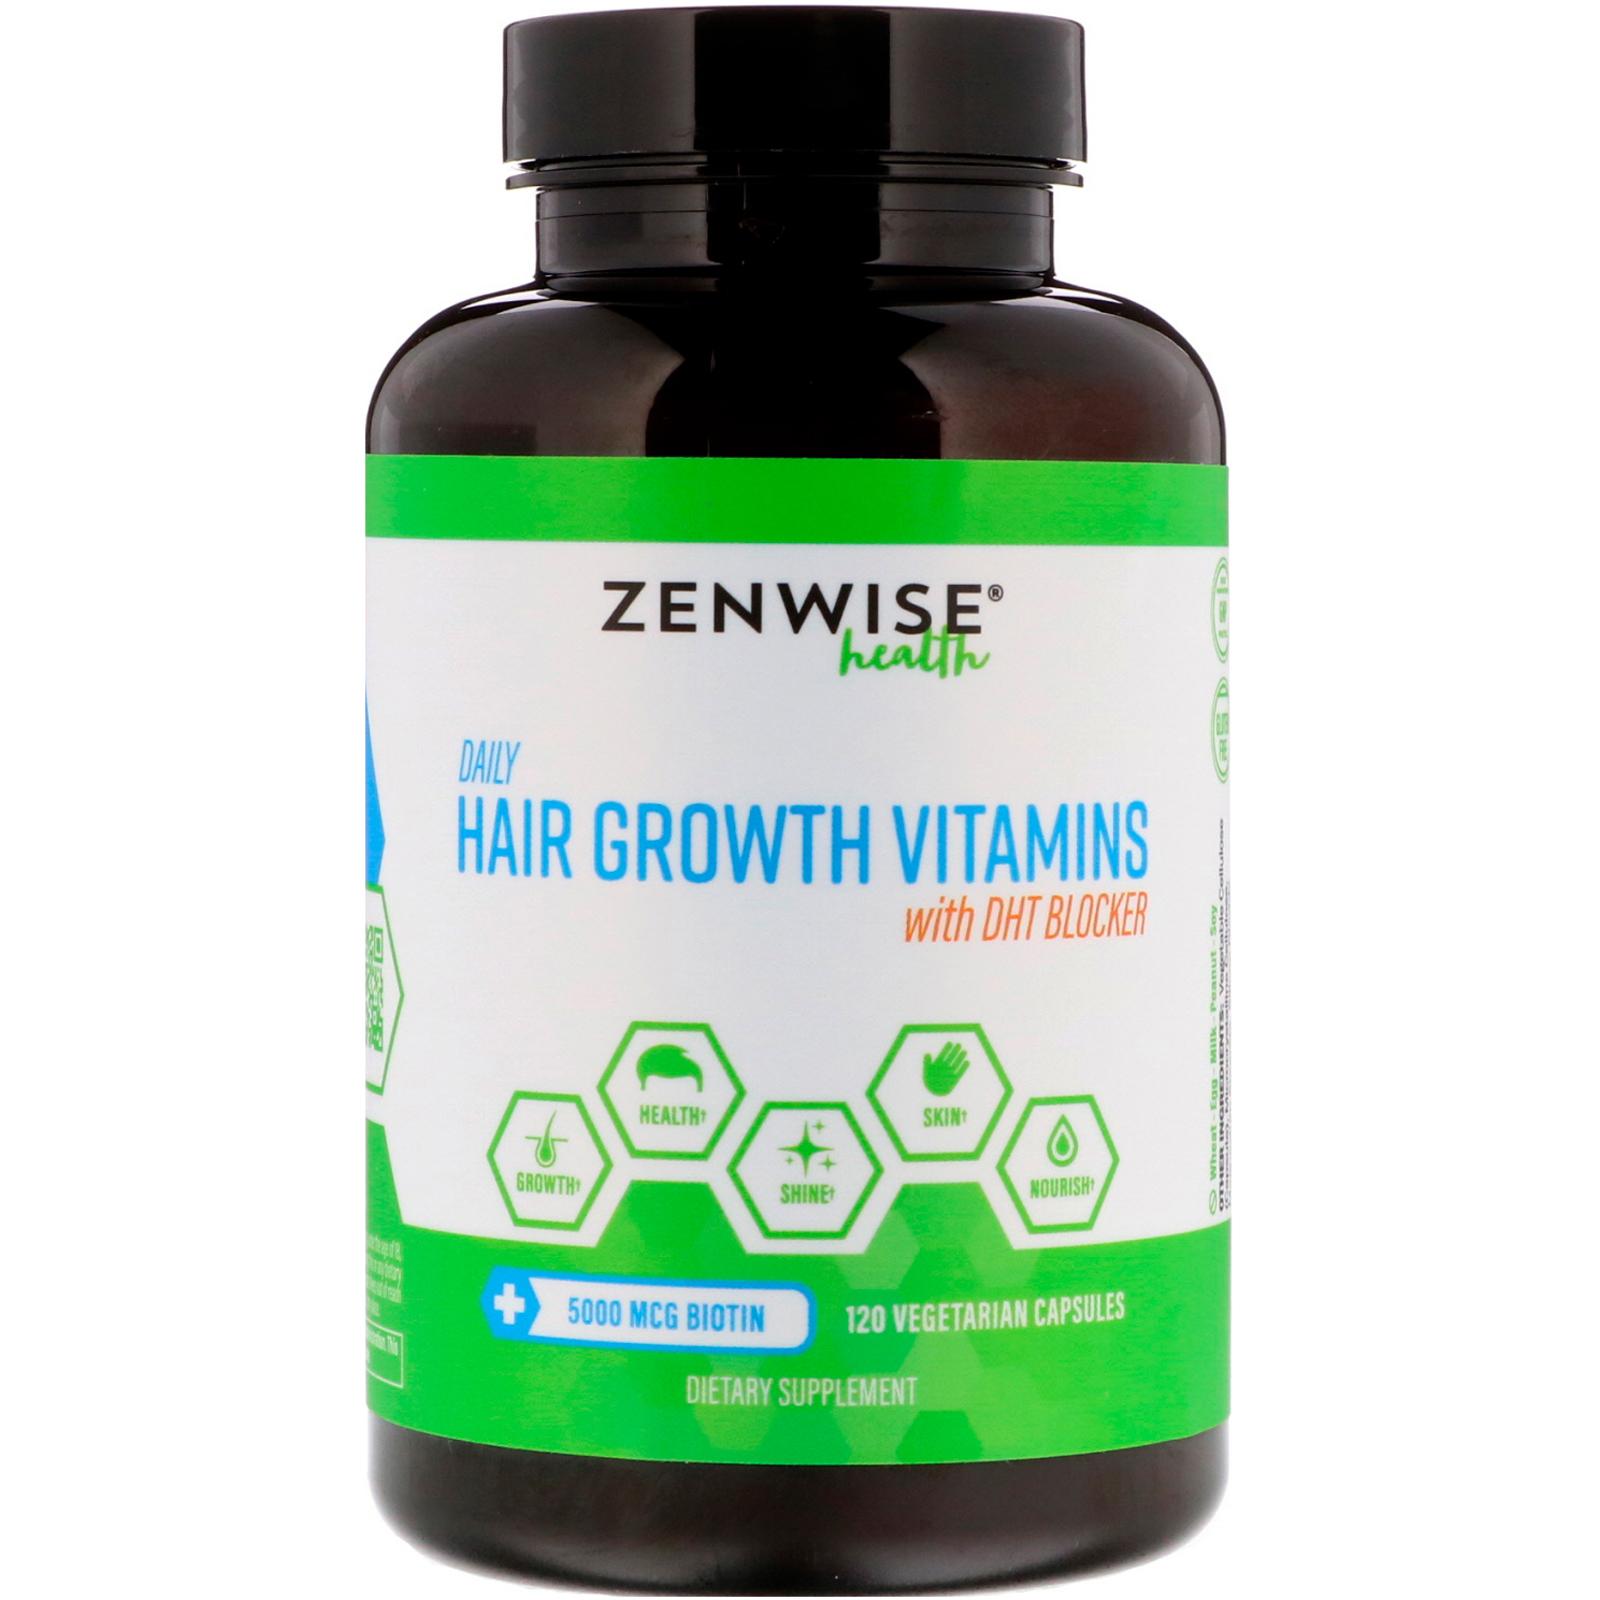 Hair Growth Vitamins >> Zenwise Health Daily Hair Growth Vitamins With Dht Blocker 120 Vegetarian Capsules